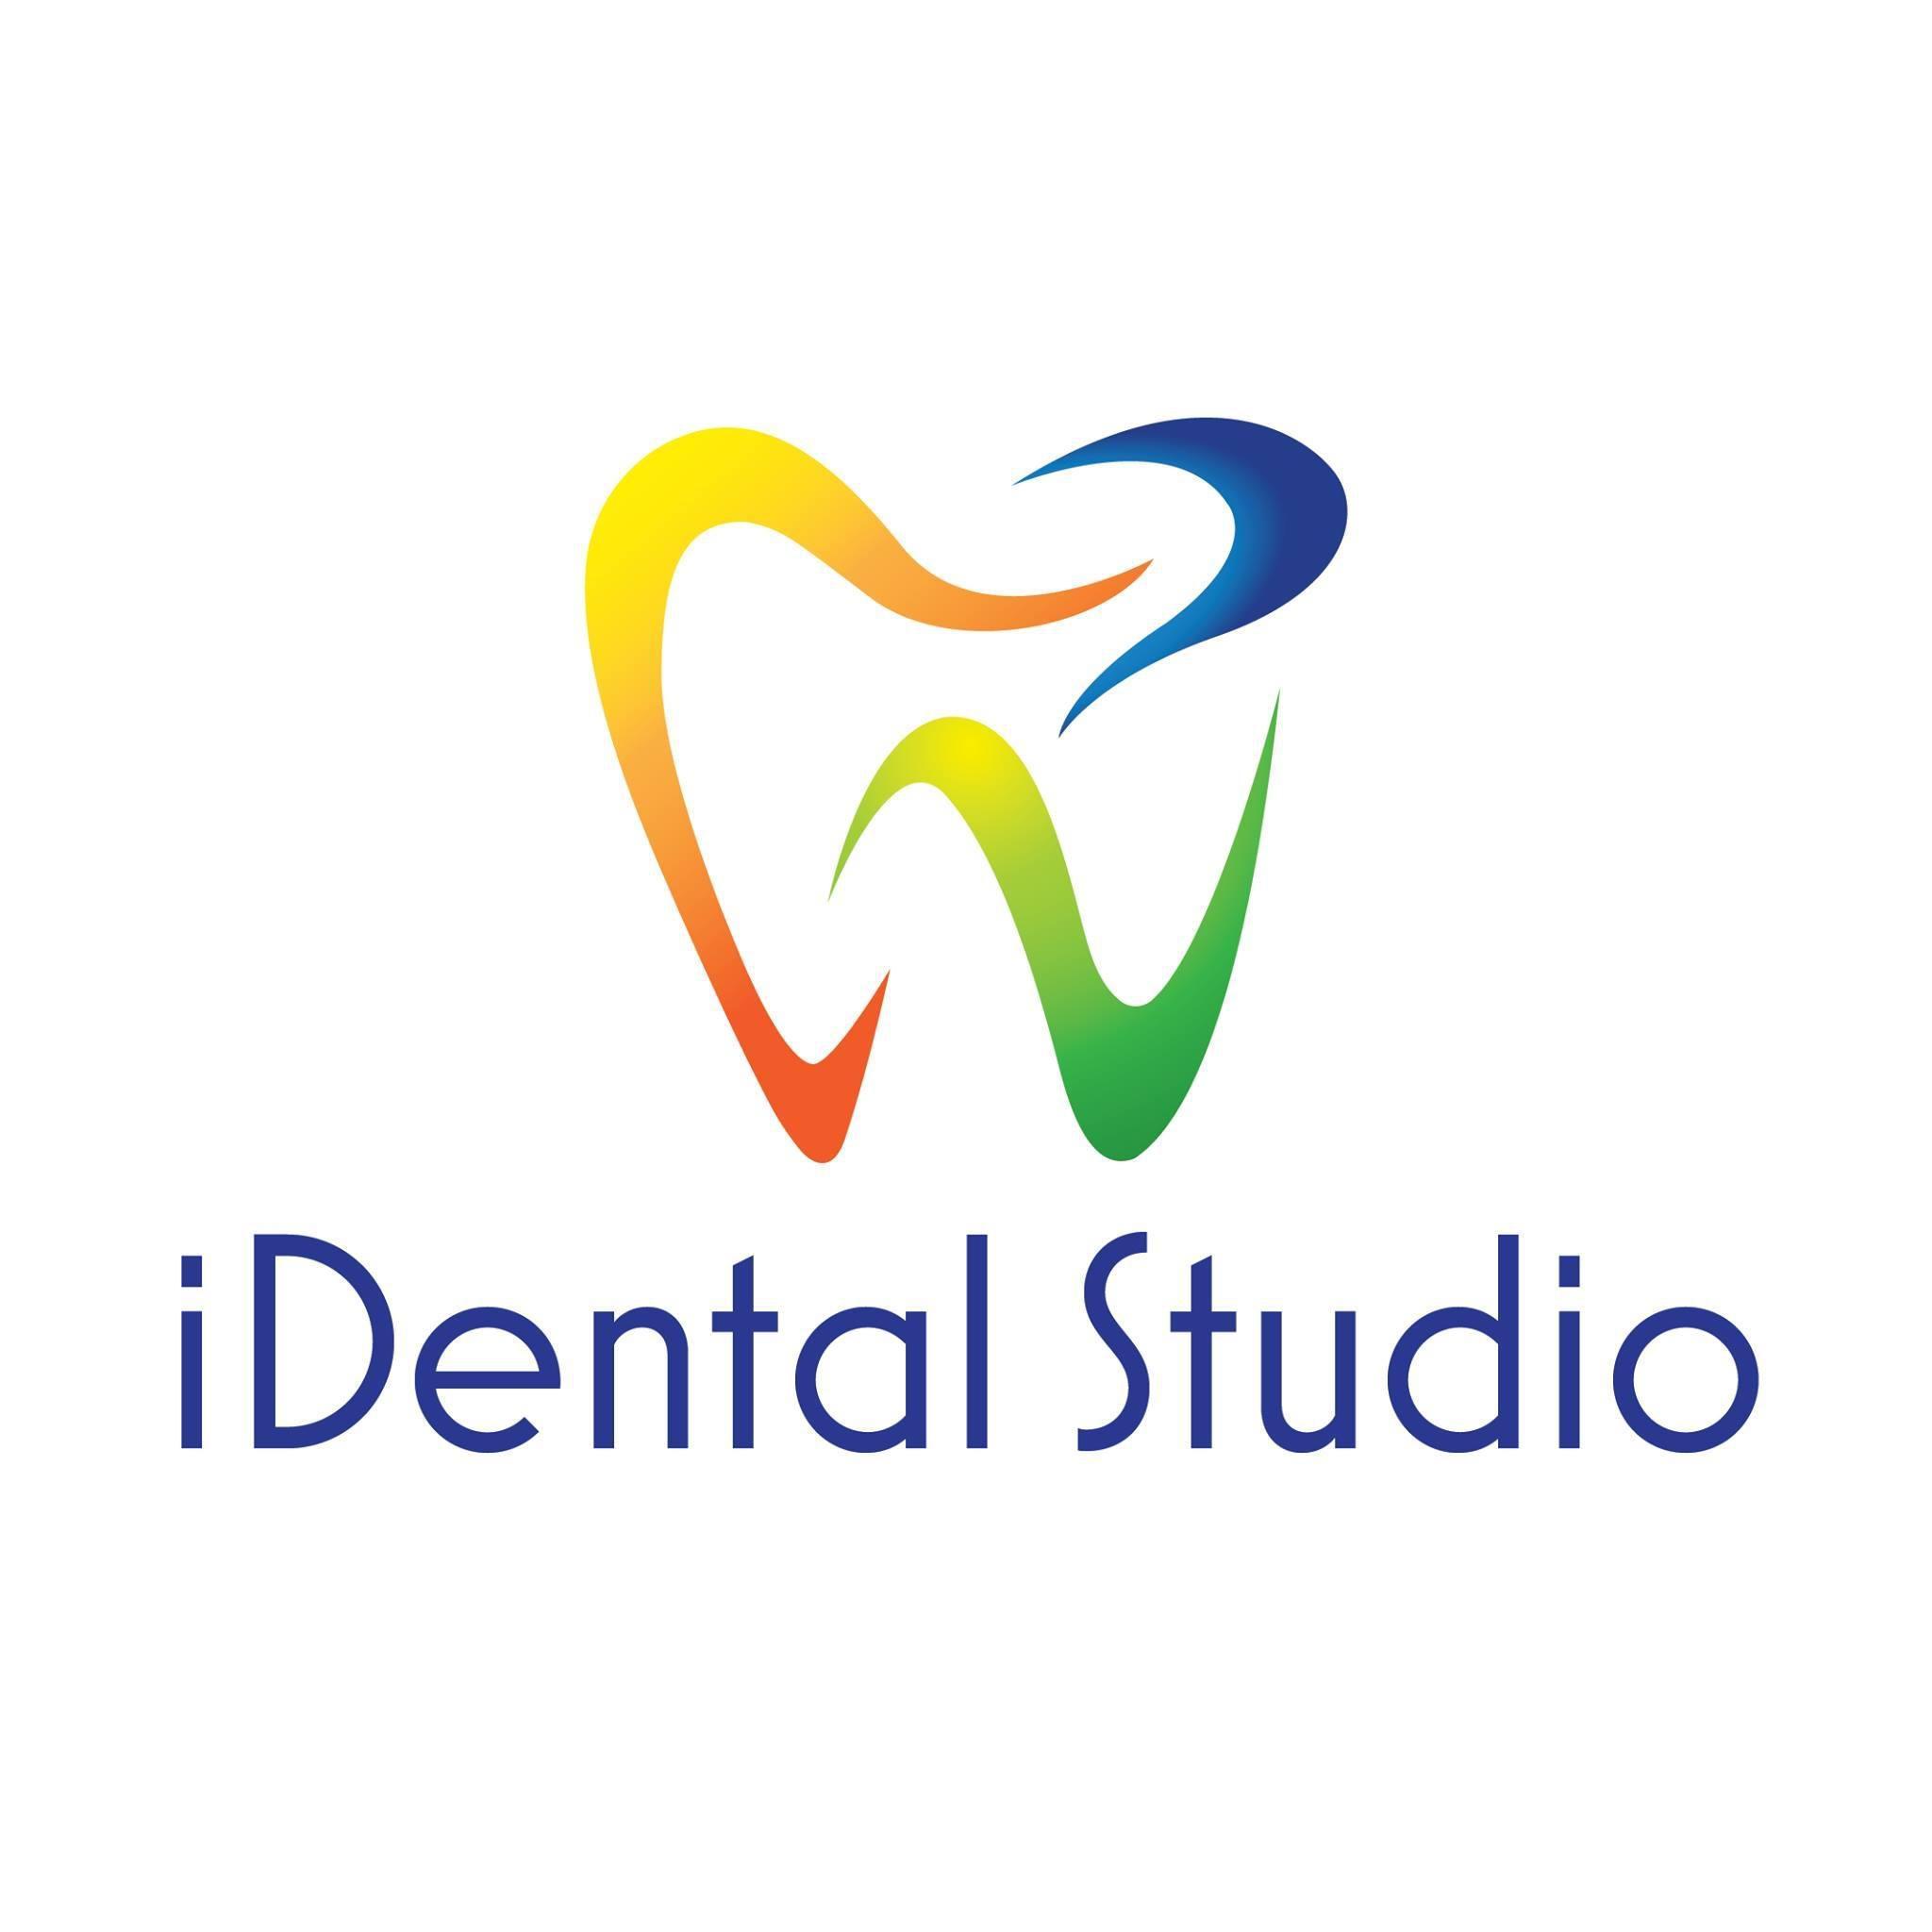 iDental Studio